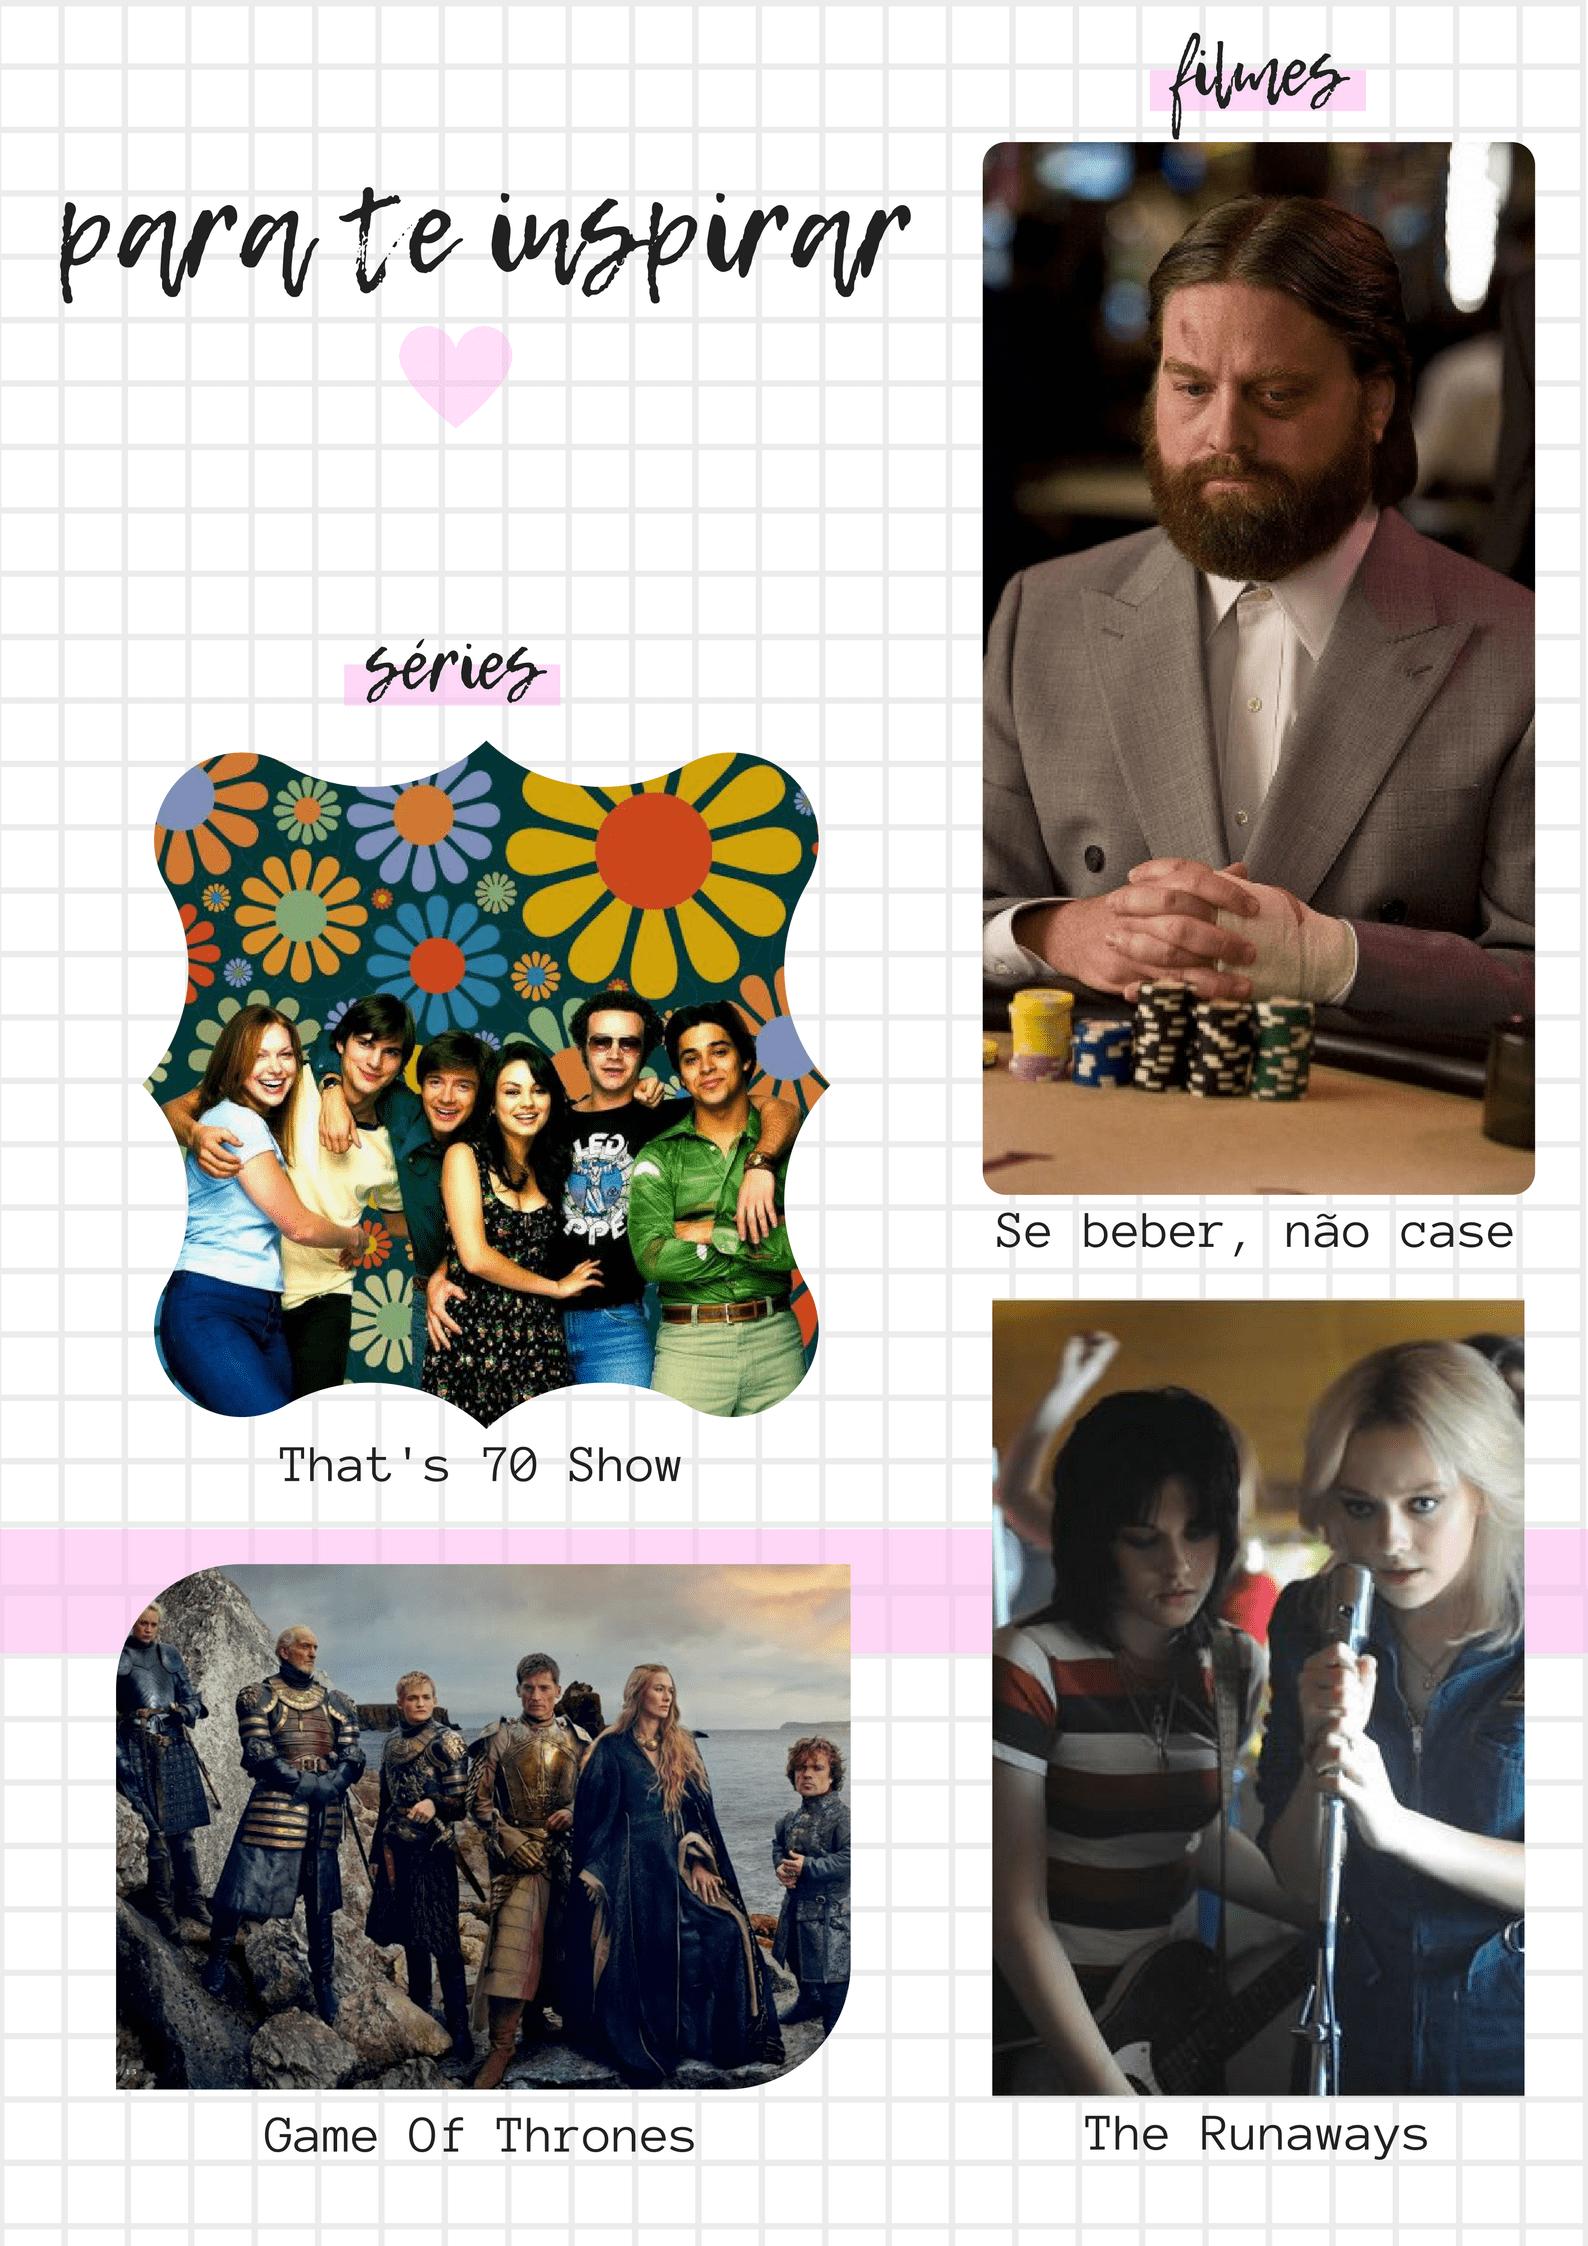 festa tematica inspiracoes filmes